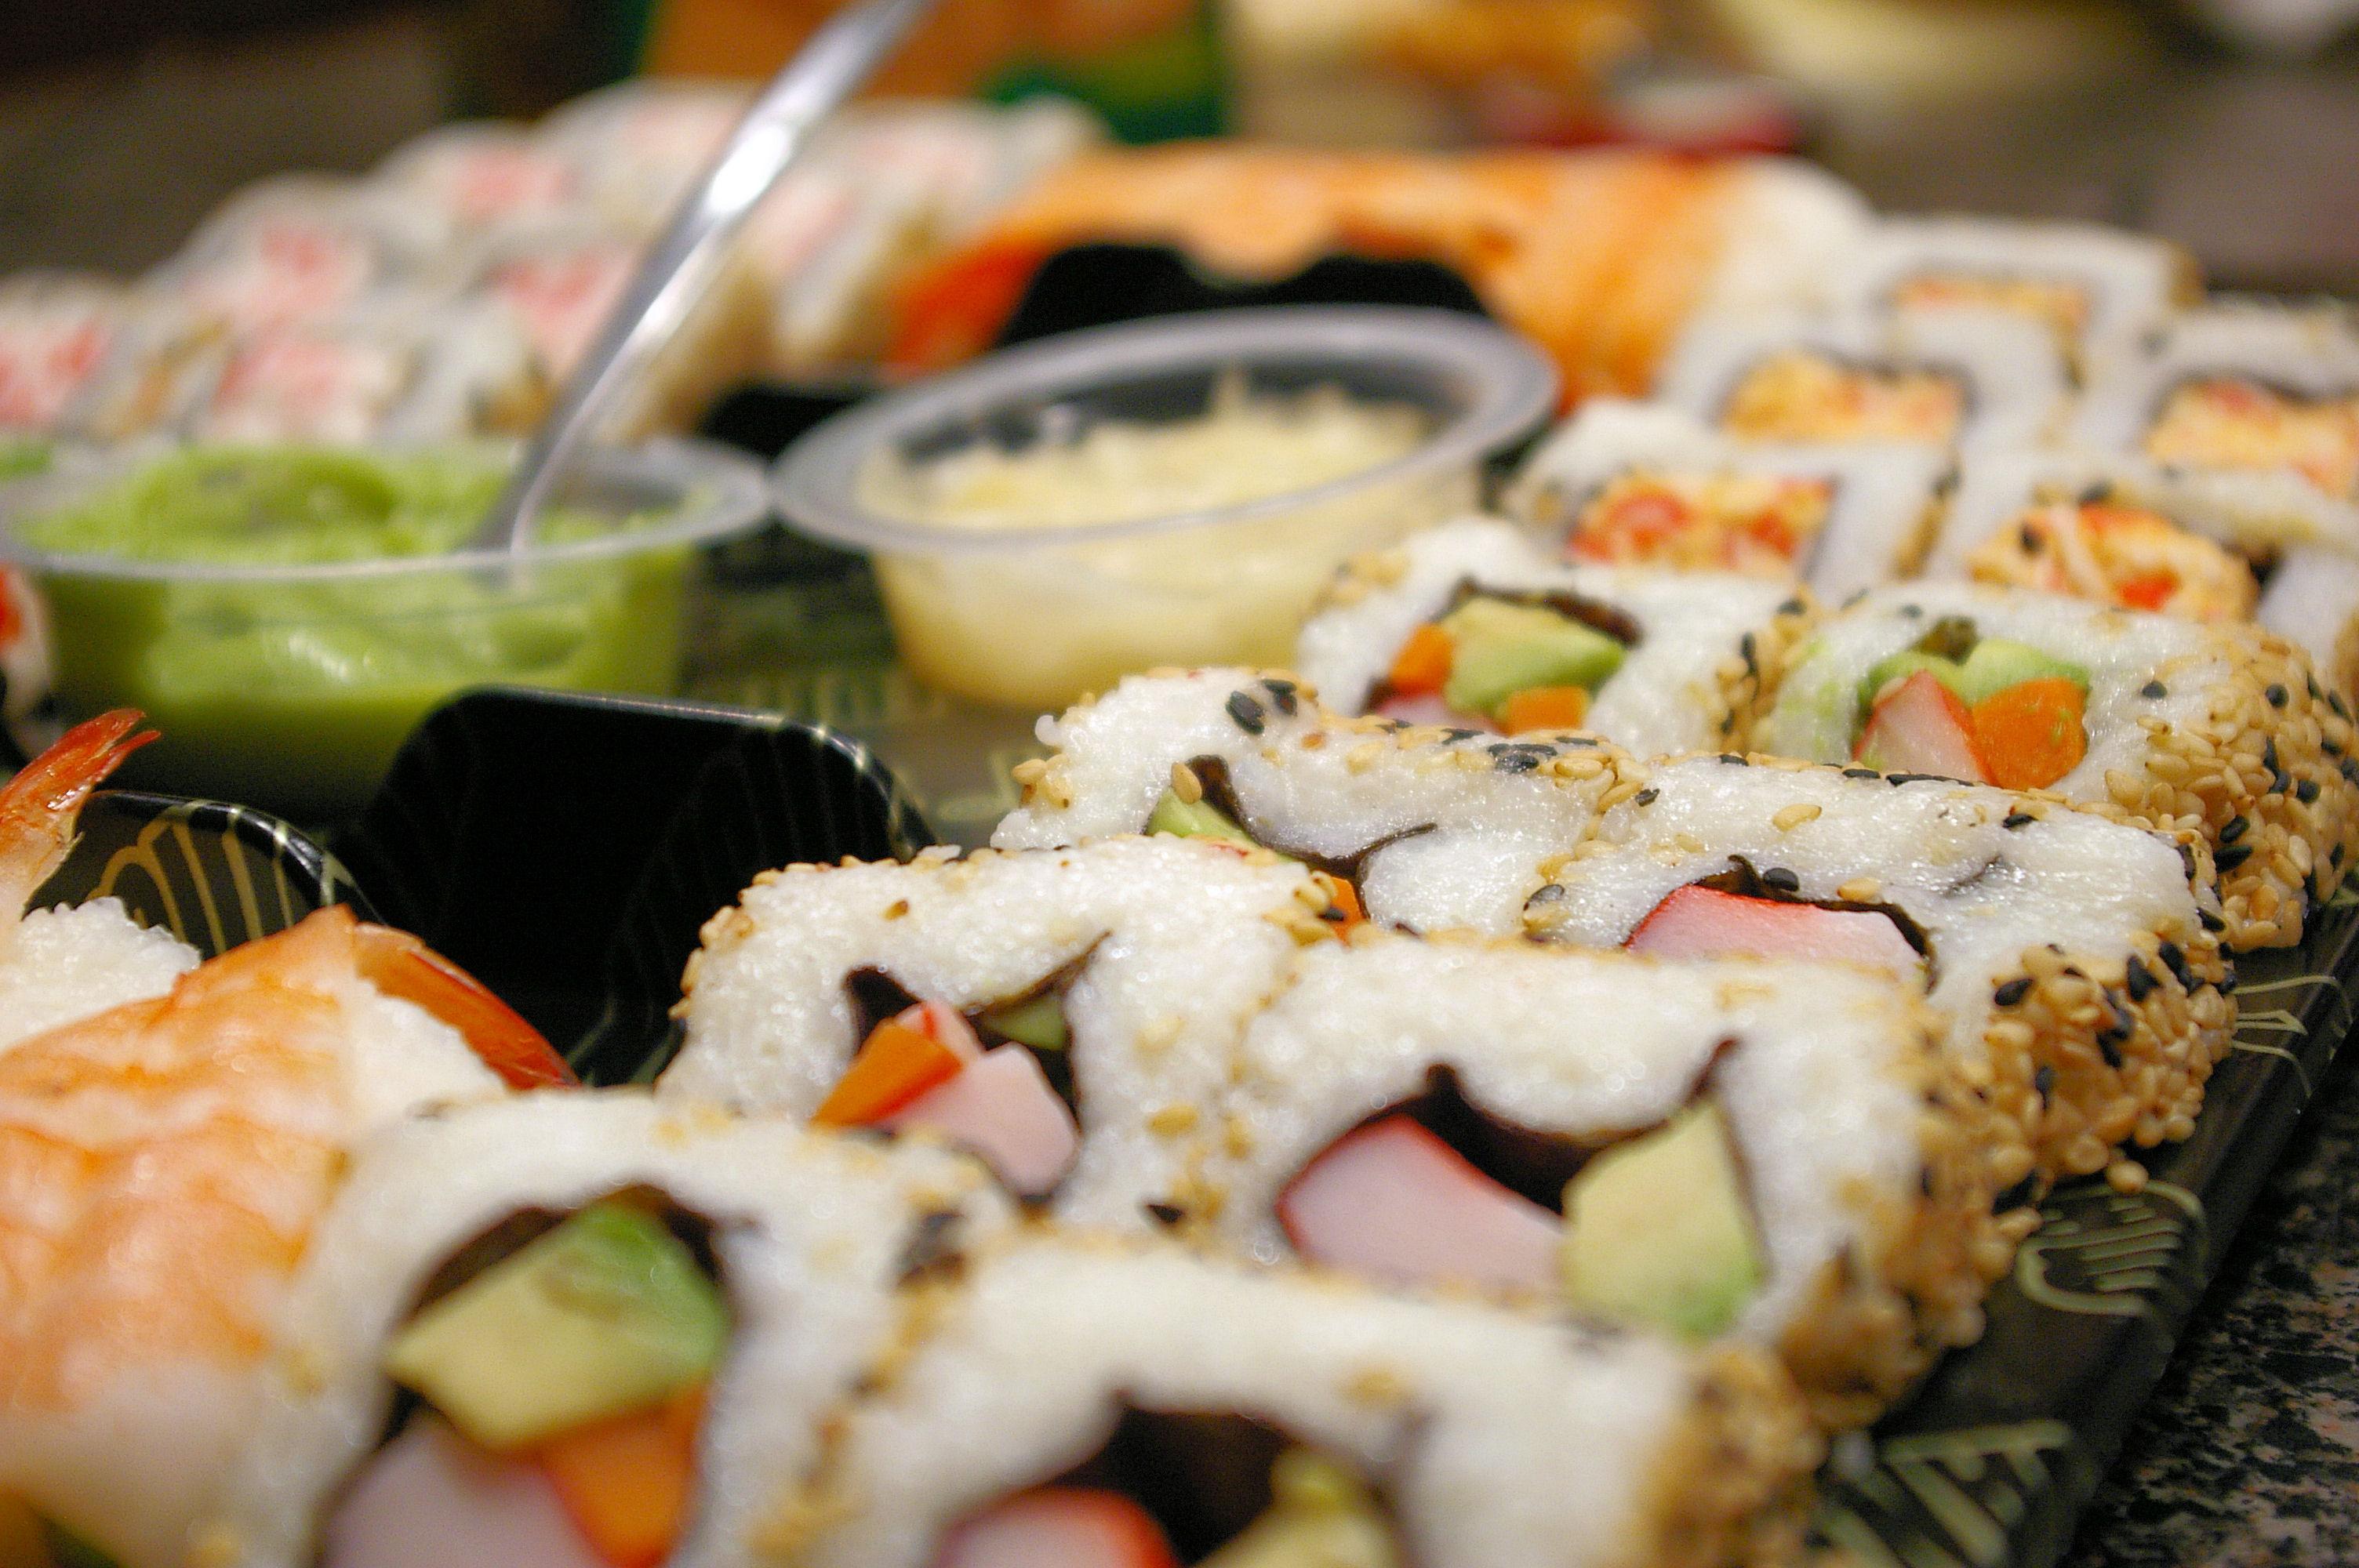 The Top 10 Restaurants In Hayward California